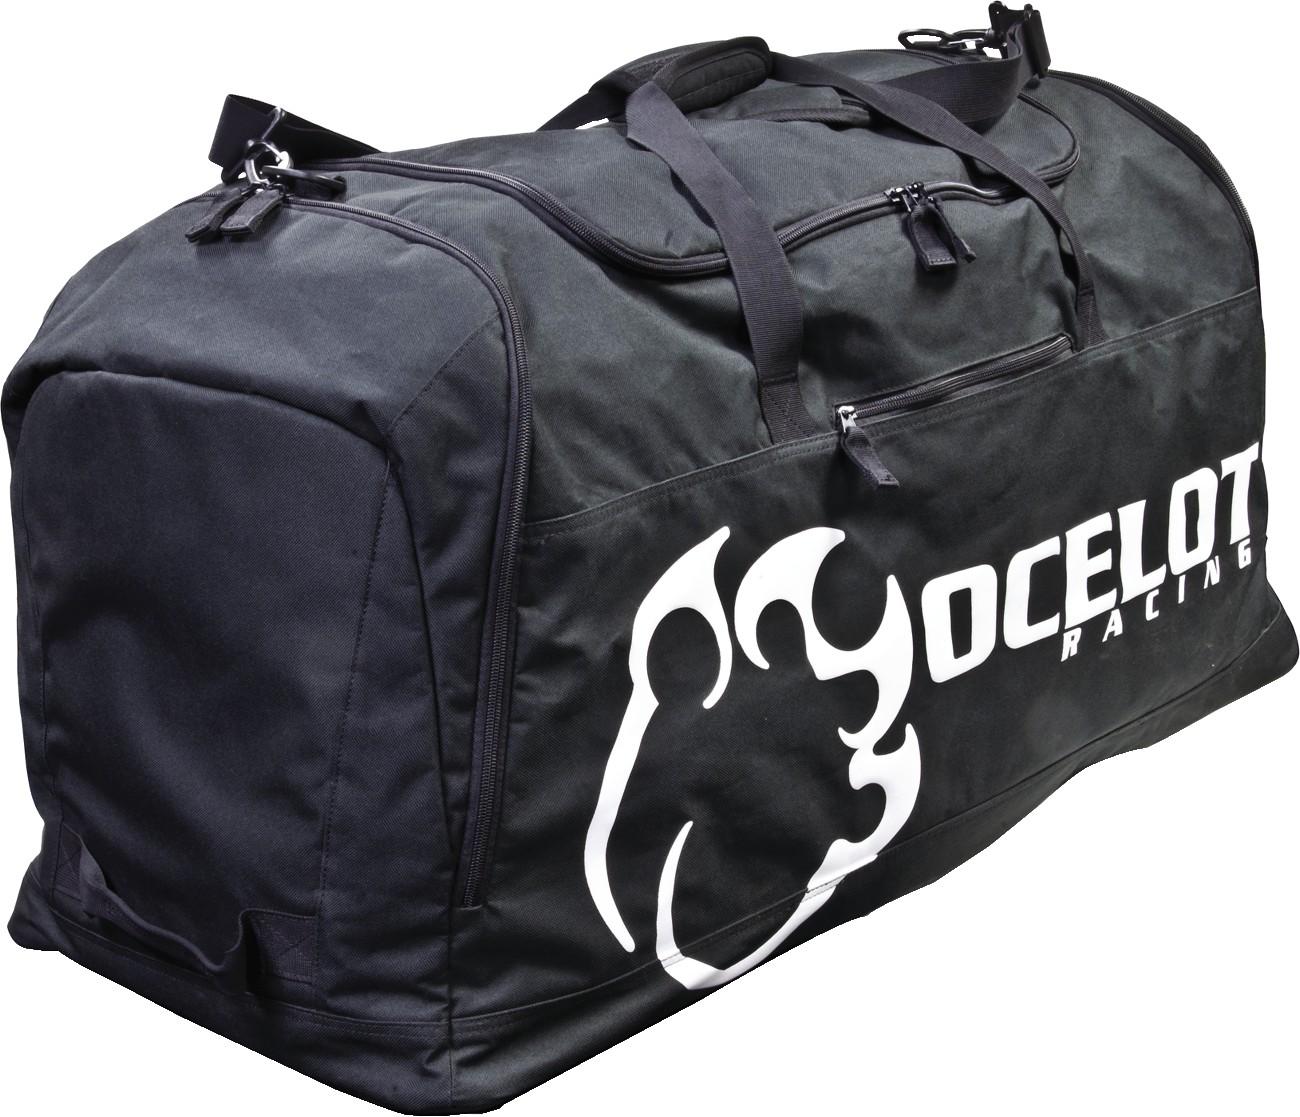 Dirt Bike Gear Bags